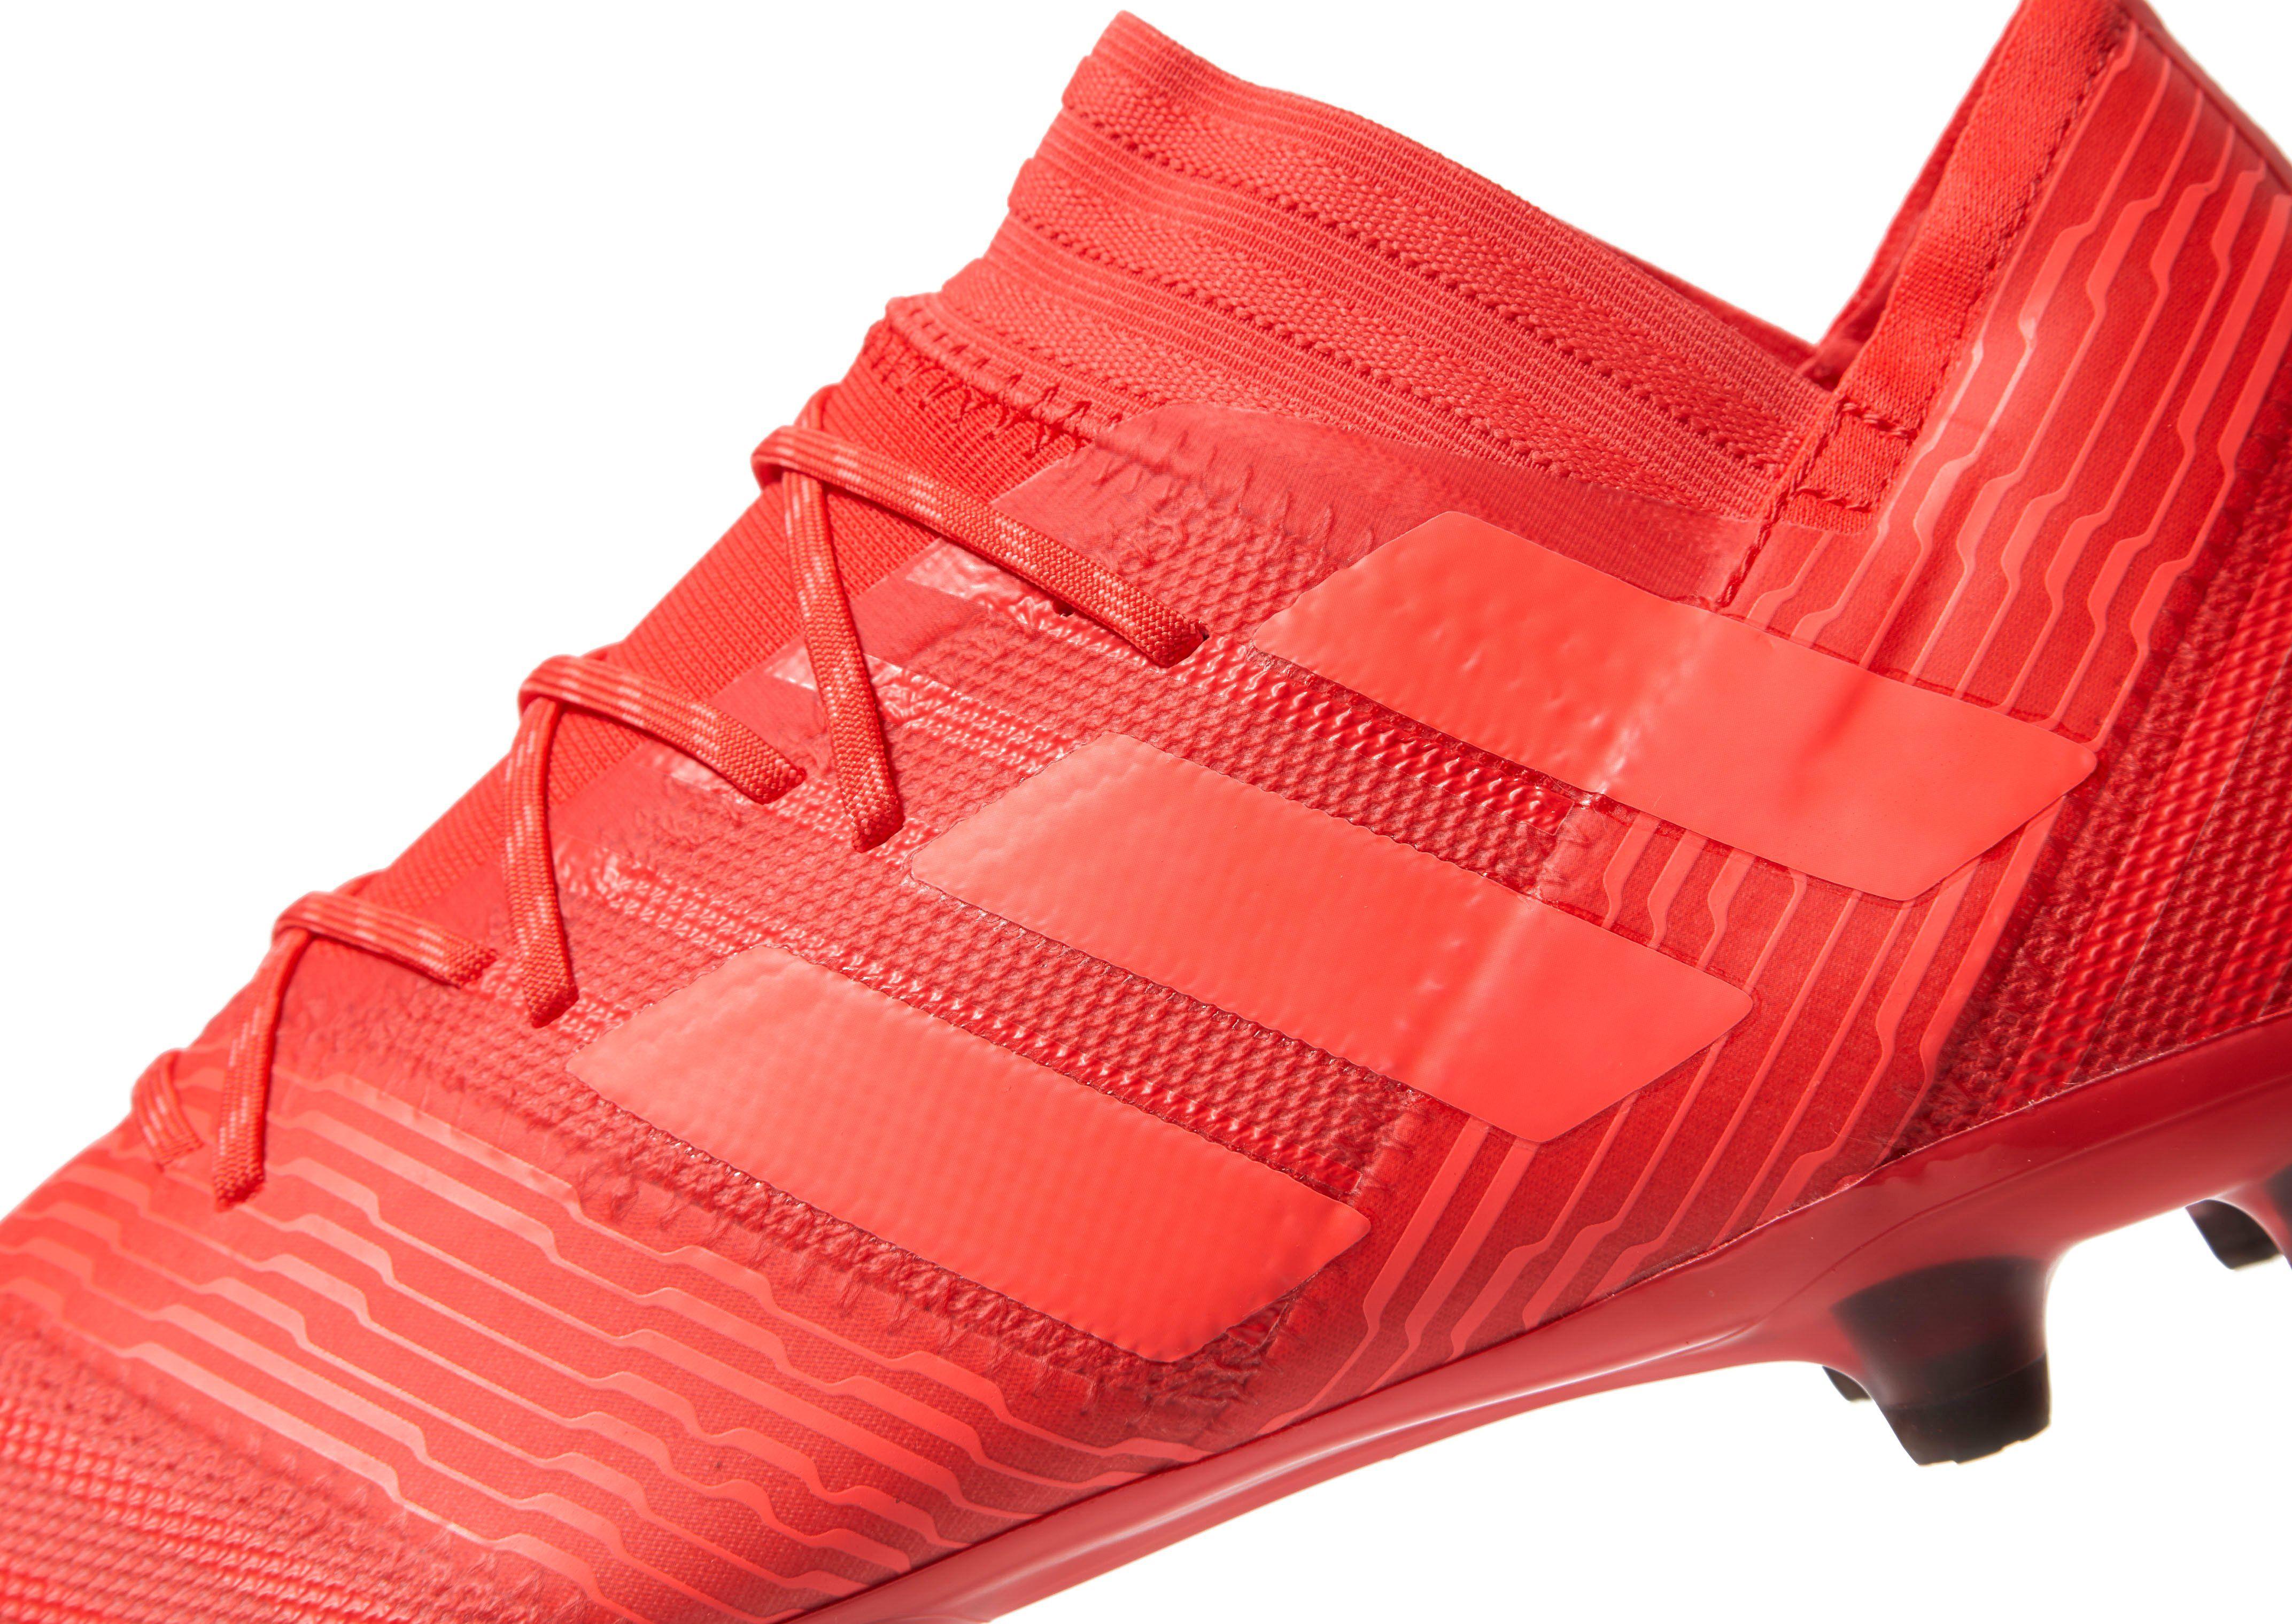 adidas Cold Blooded Nemeziz 17.2 FG